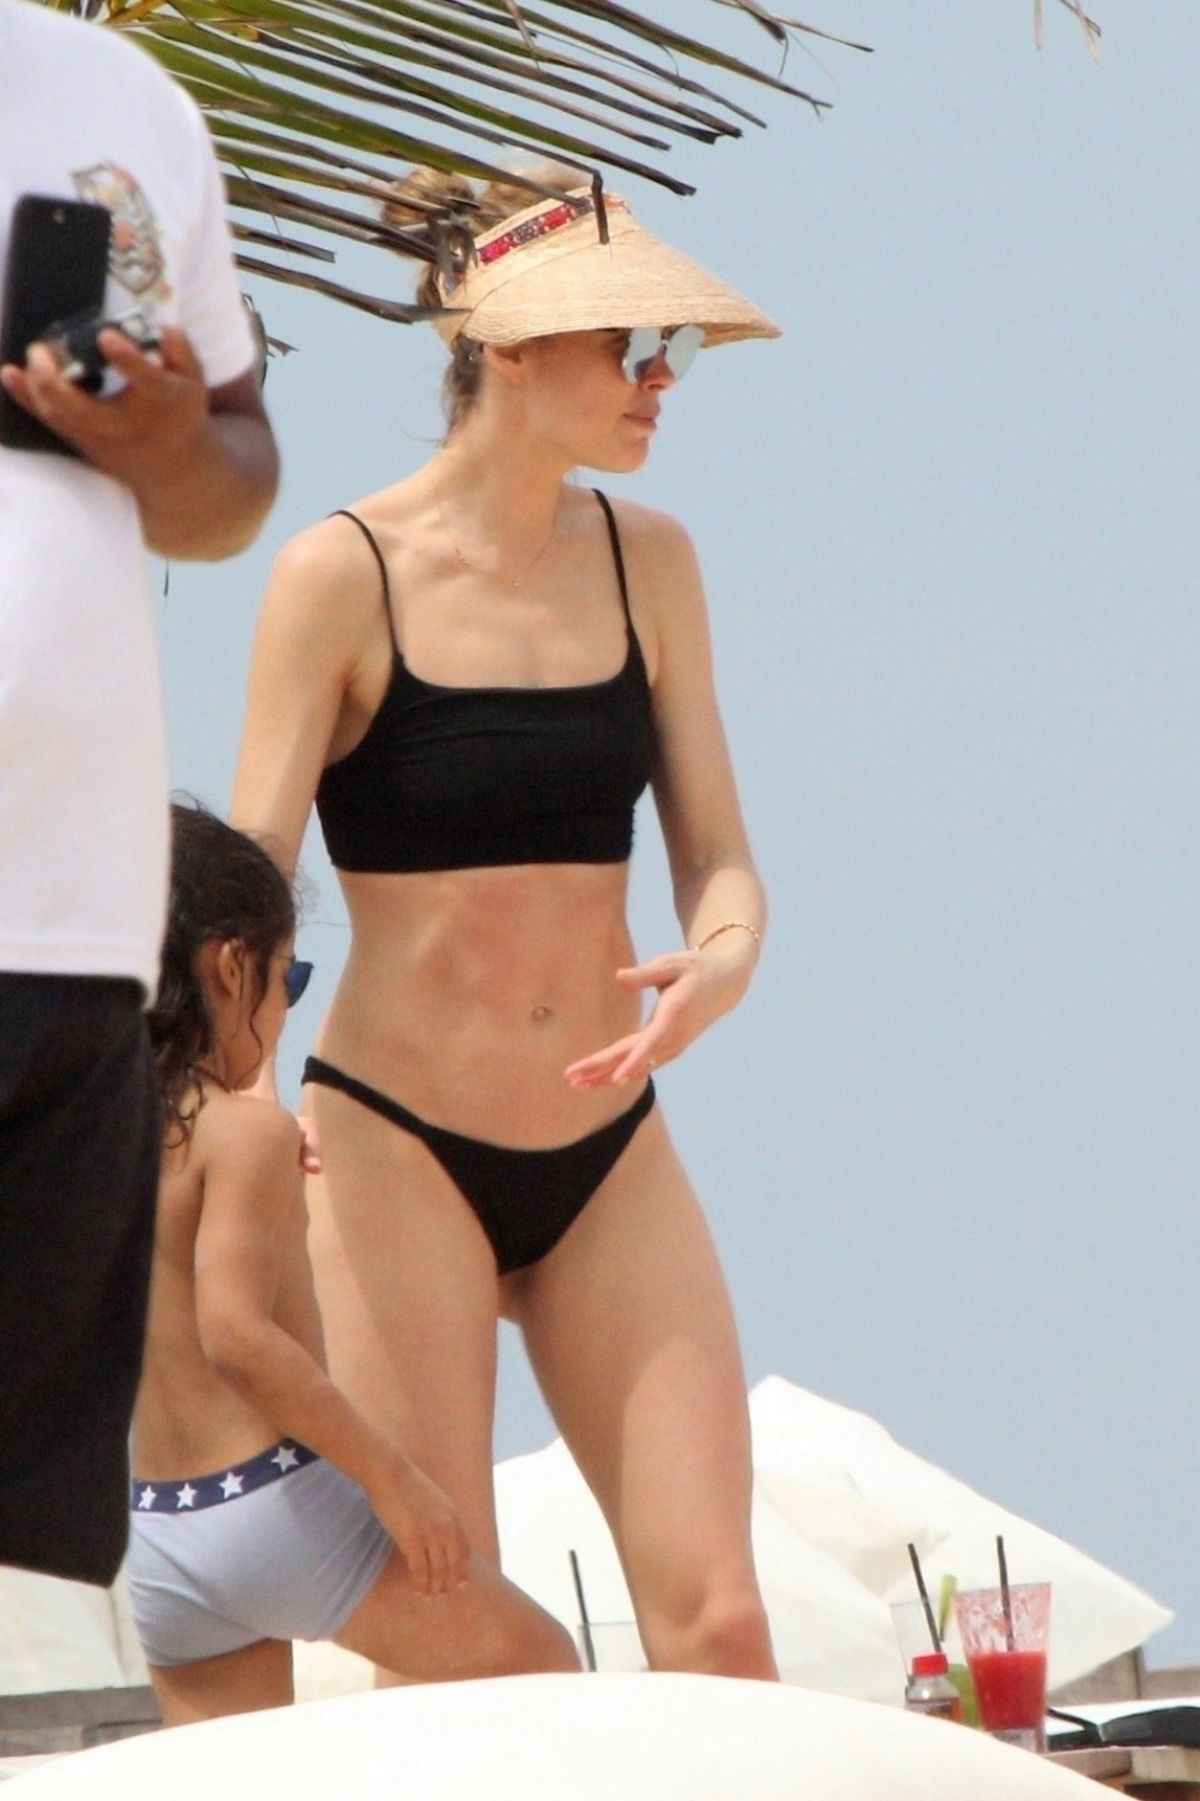 Doutzen Kroes in Bikini in Bahia Pic 3 of 35